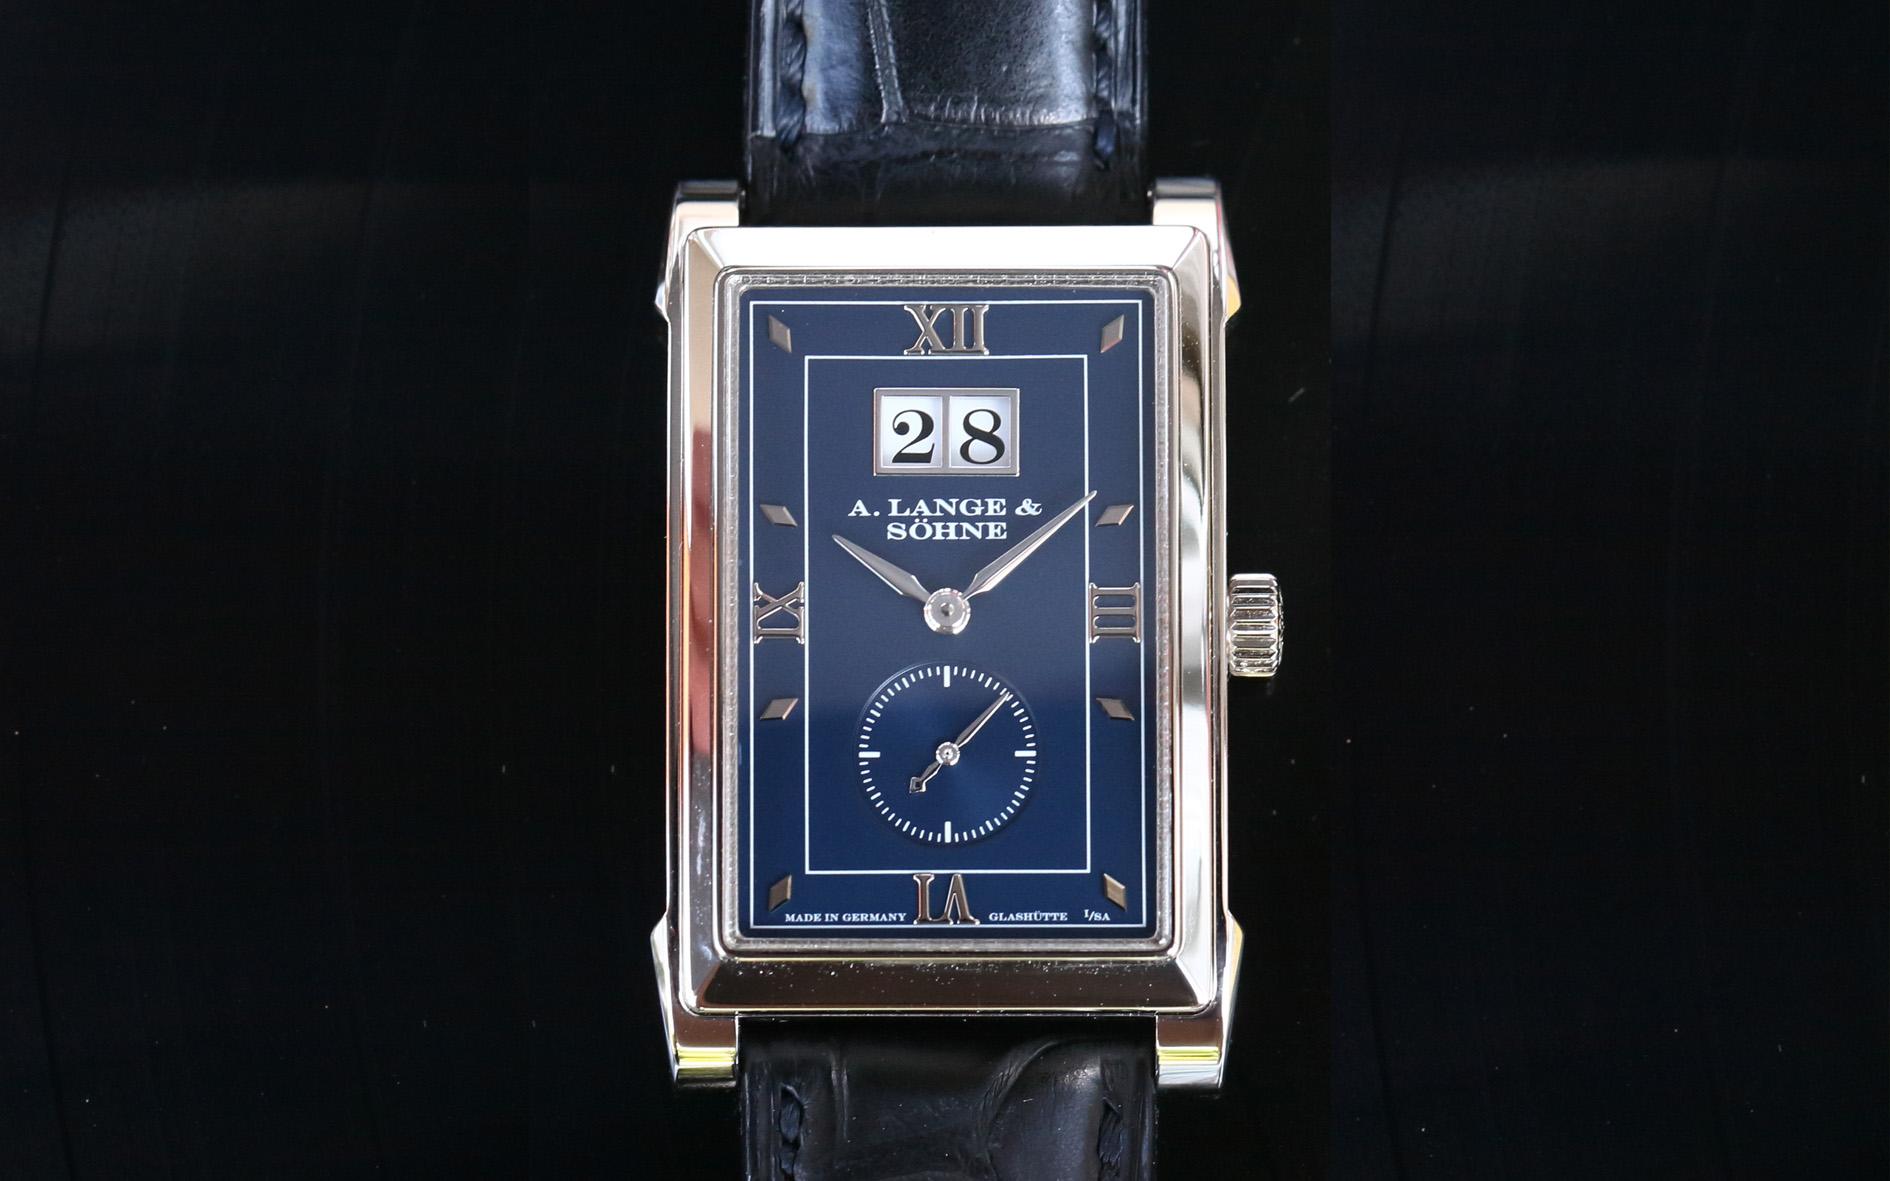 a lange söhne cabaret white gold blue dial reference 107.027